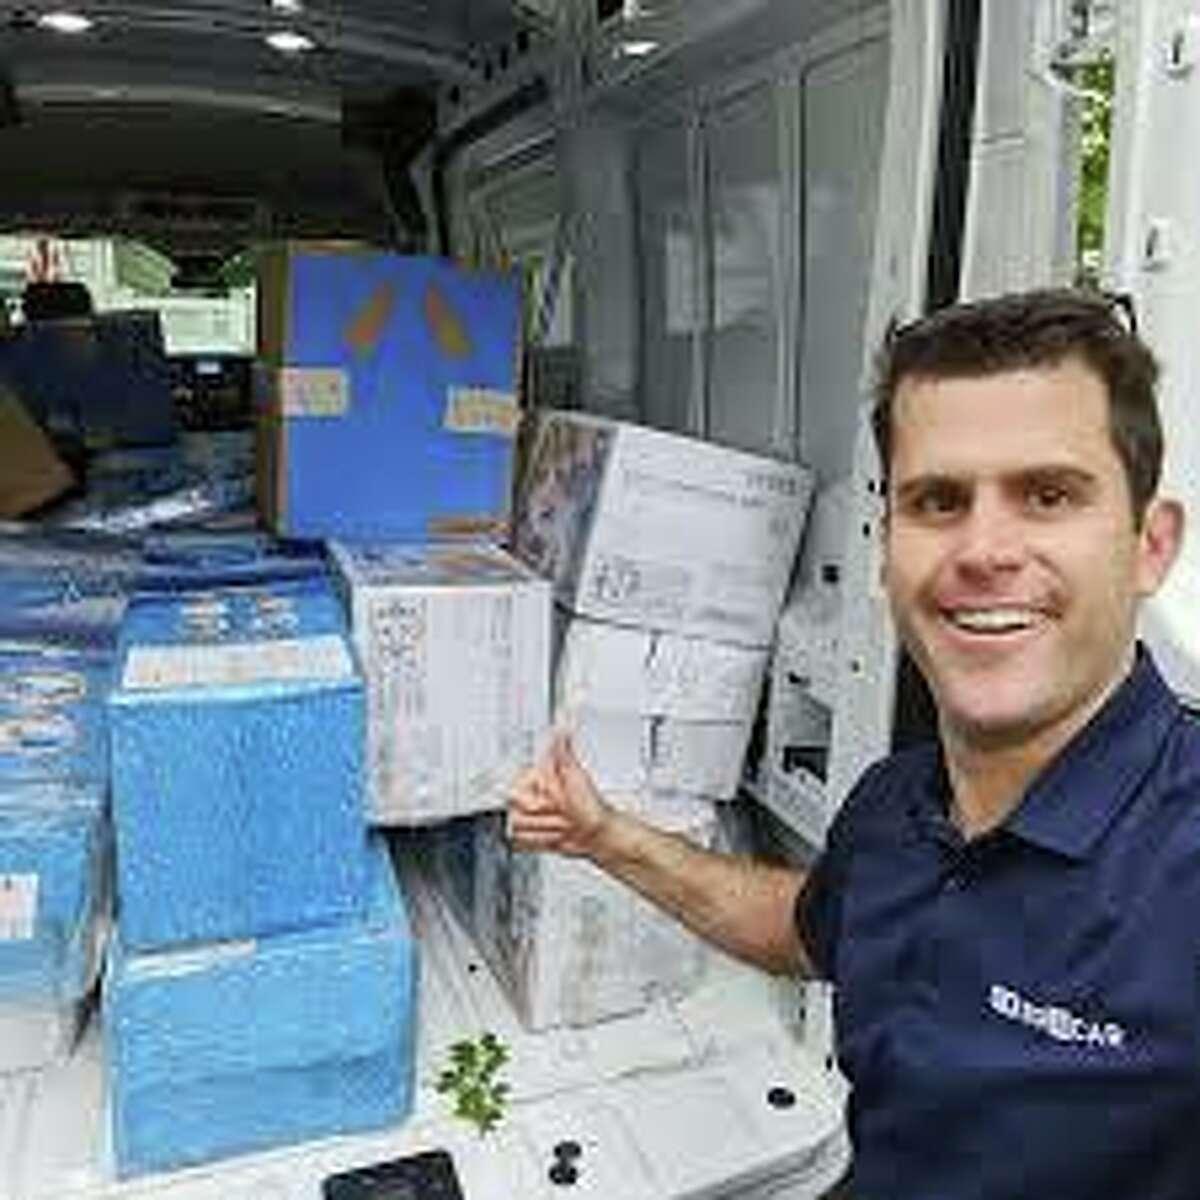 Boxcar CEO Joe Colangelo developed a contact-less food box drive-thru service.